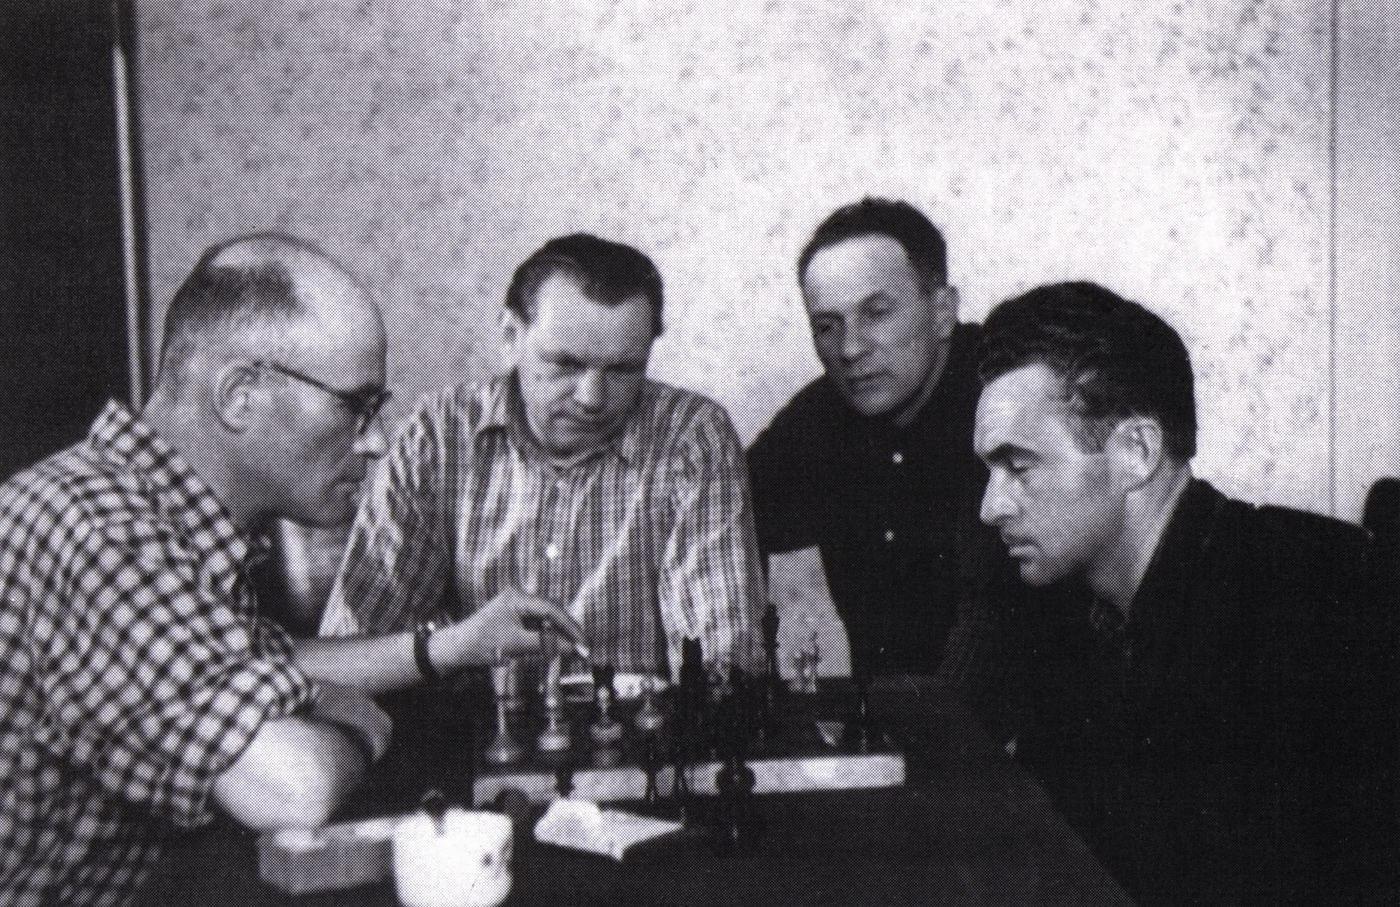 Gabriel Gluck, Adalbert Marton, Zoltan Sholtes, Anton Kashshai playing chess